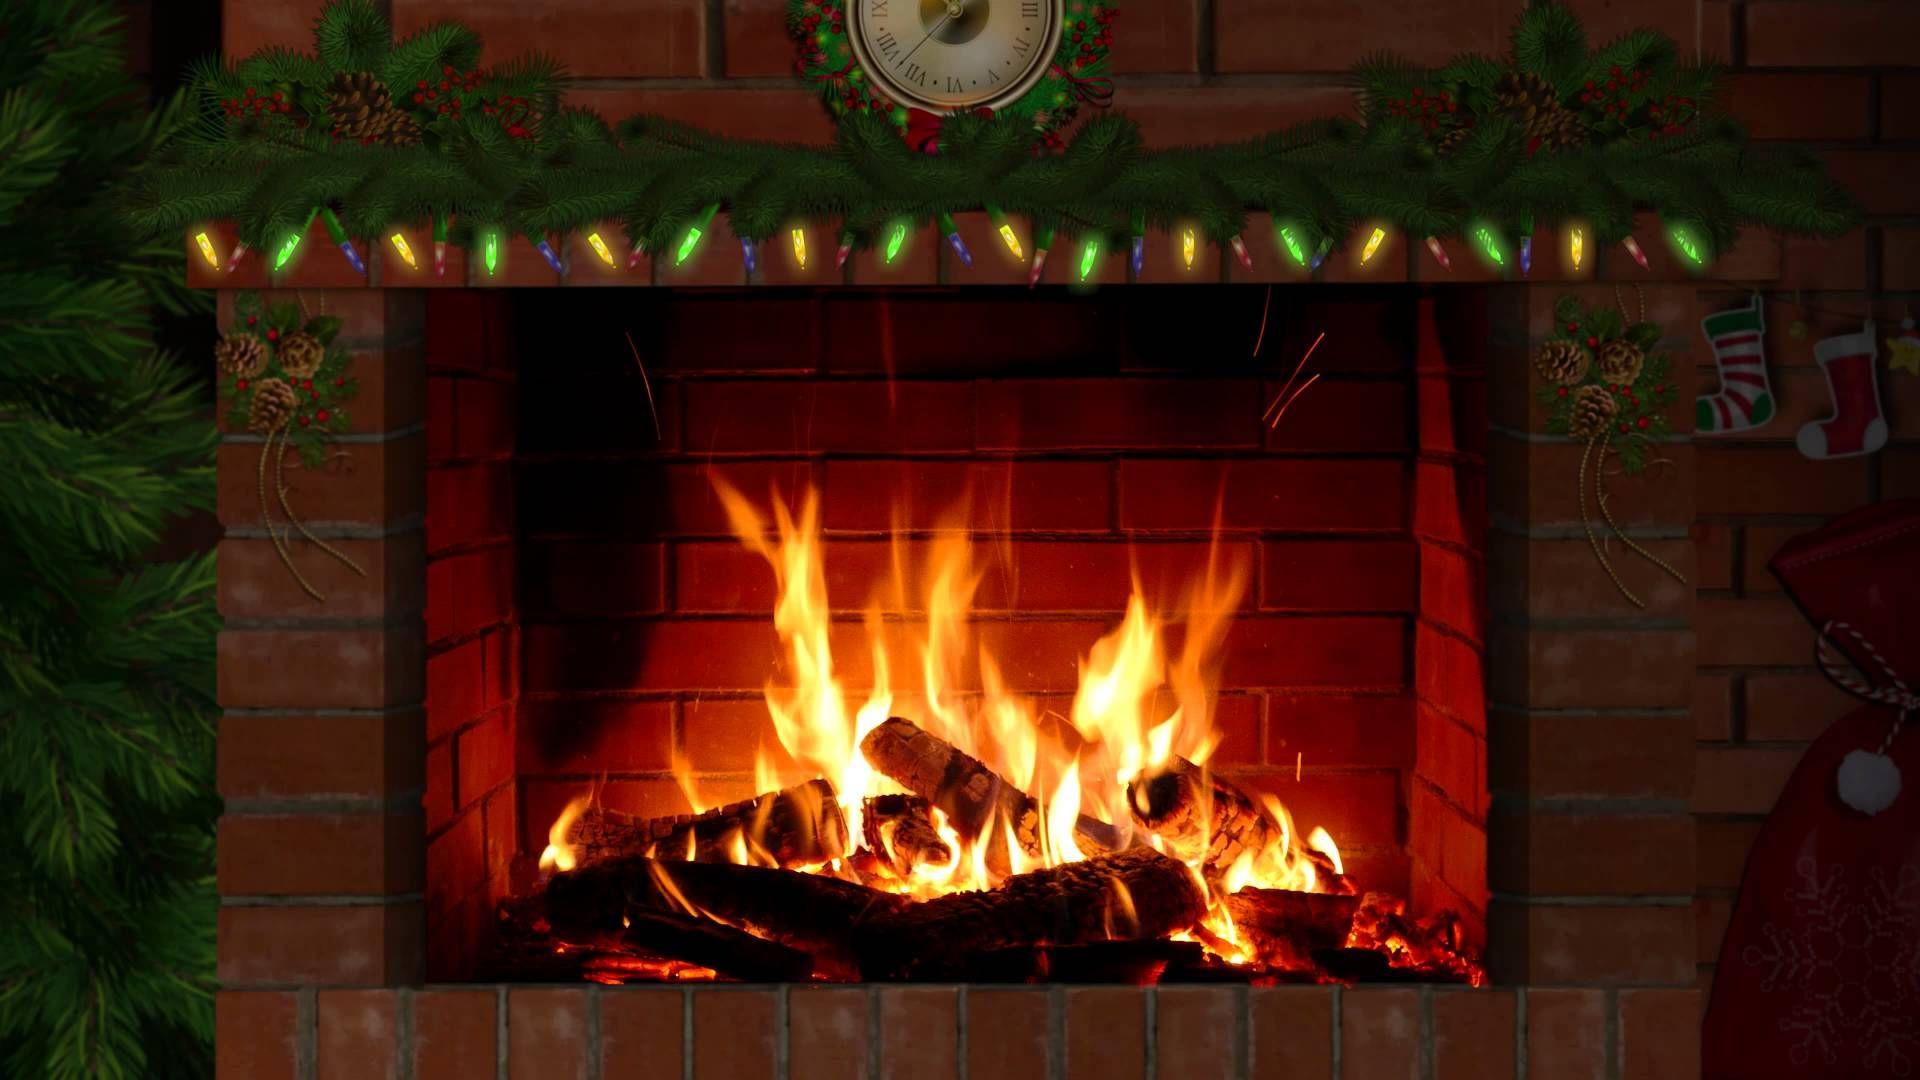 Christmas Fireplace Music  Fireplace with Christmas music 3 hours Enjoy Christmas